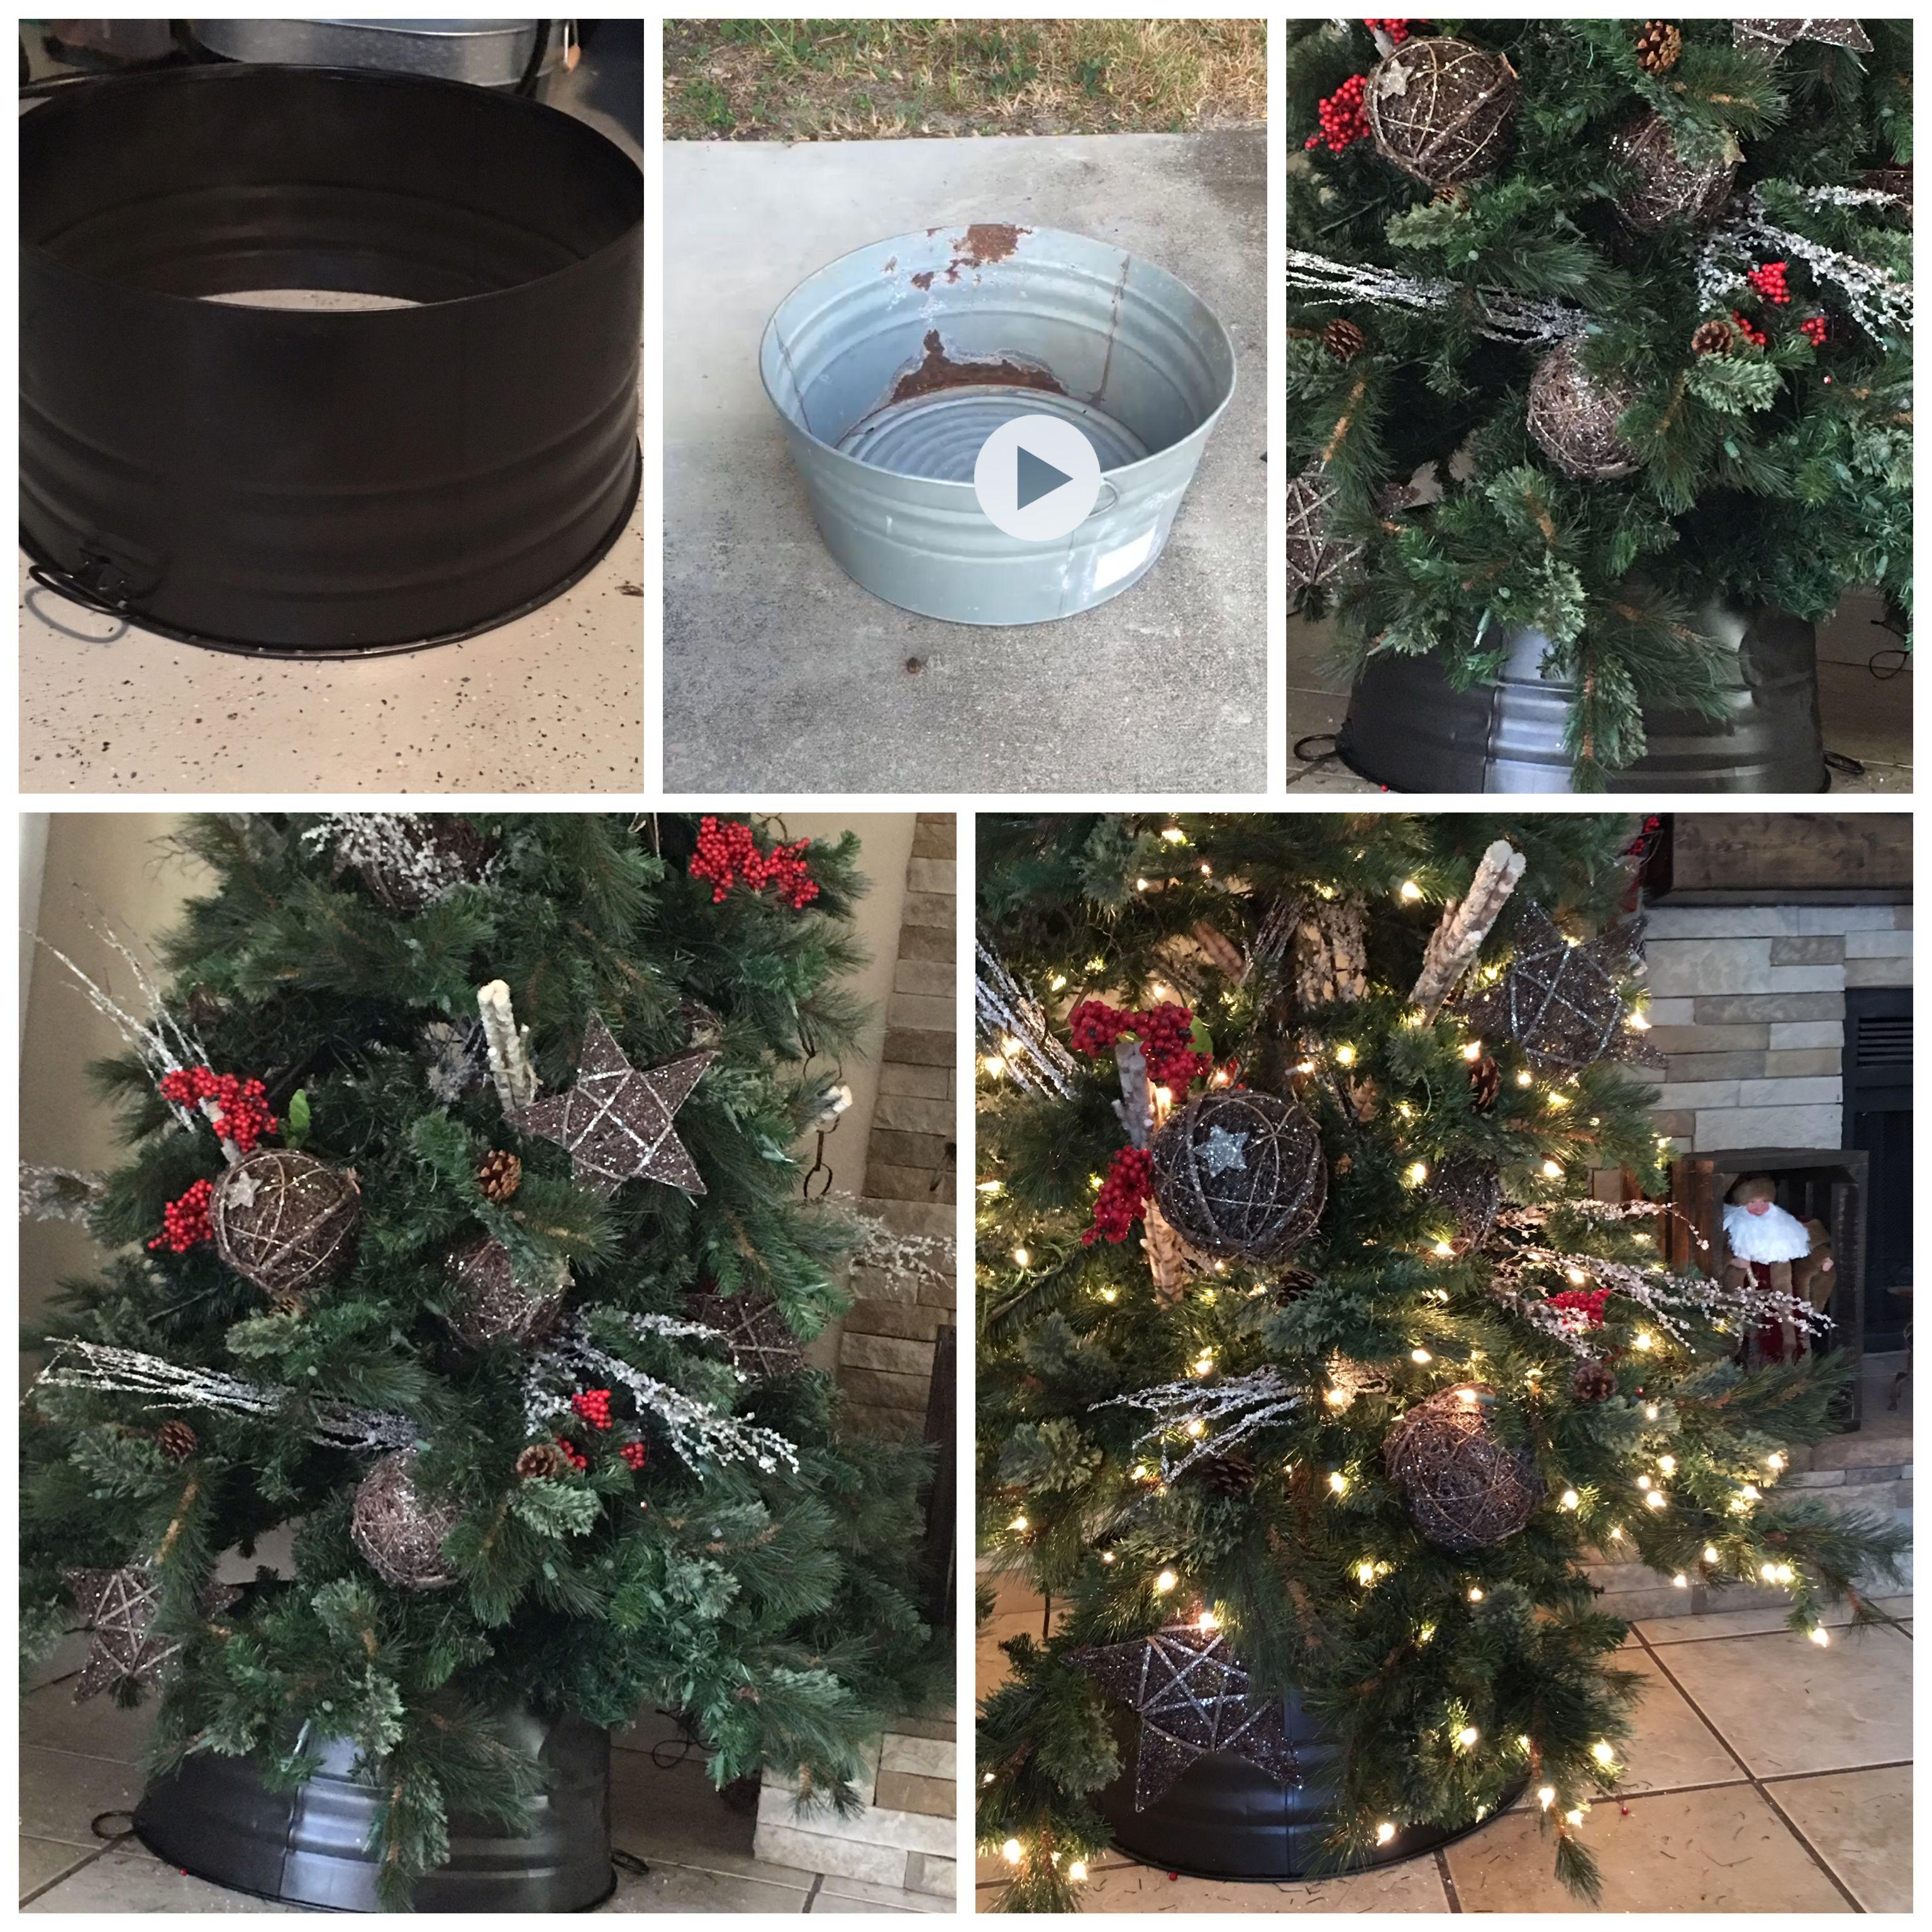 DIY Galvanized Tree Collar sold in department stores 50